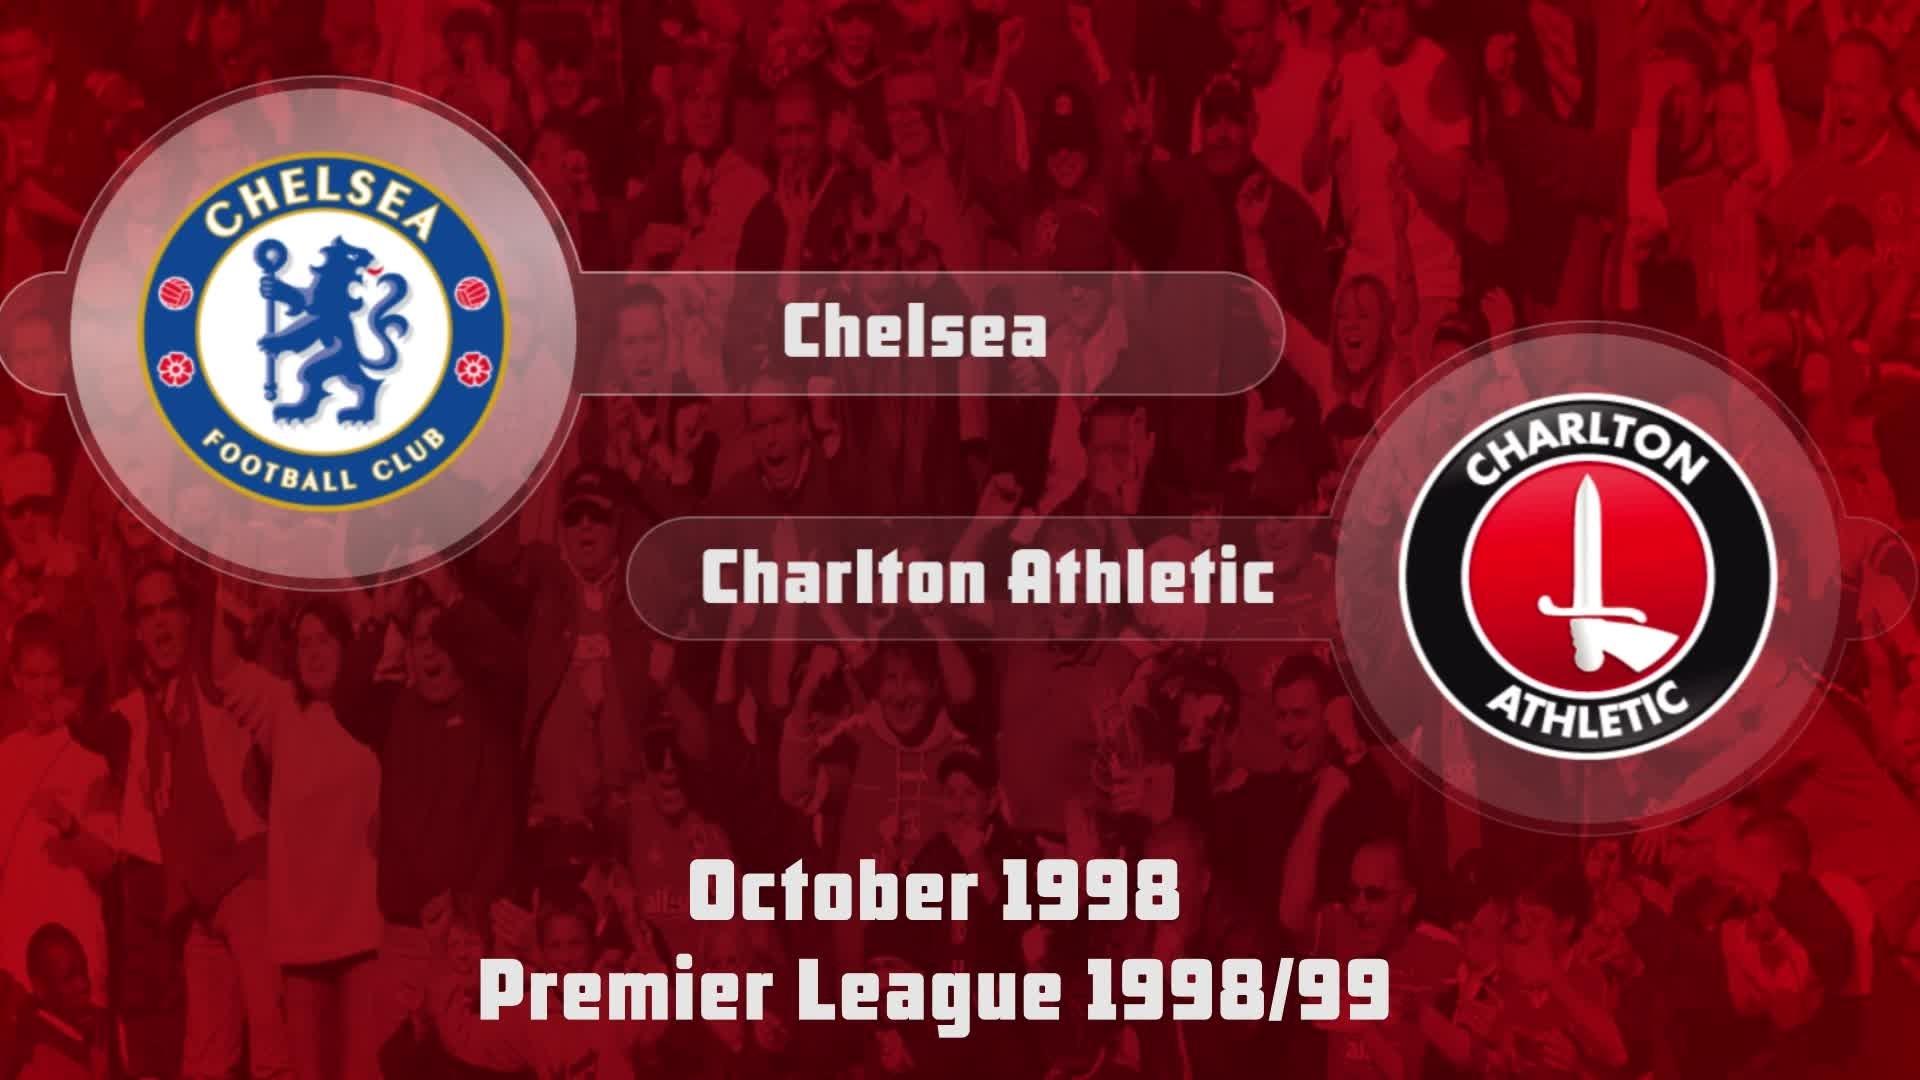 11 HIGHLIGHTS | Chelsea 2 Charlton 1 (Oct 1998)